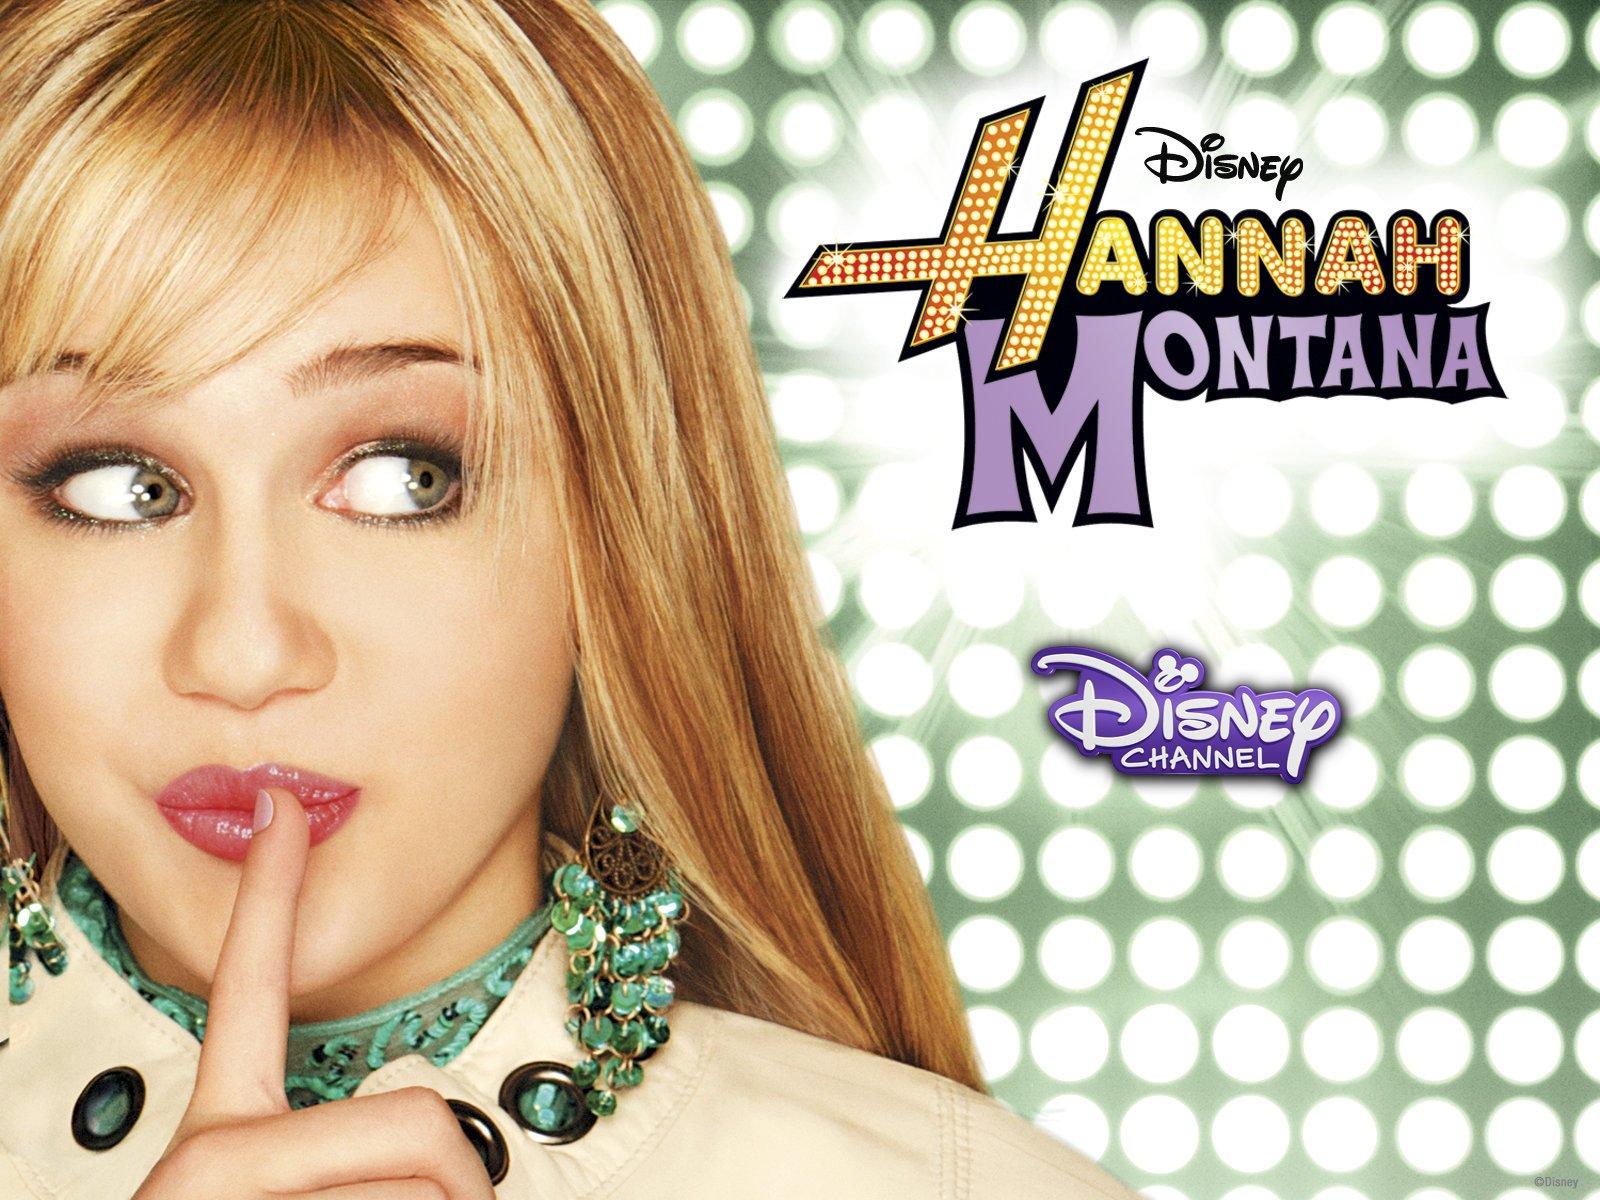 Amusing message teen stars g hannah montana agree